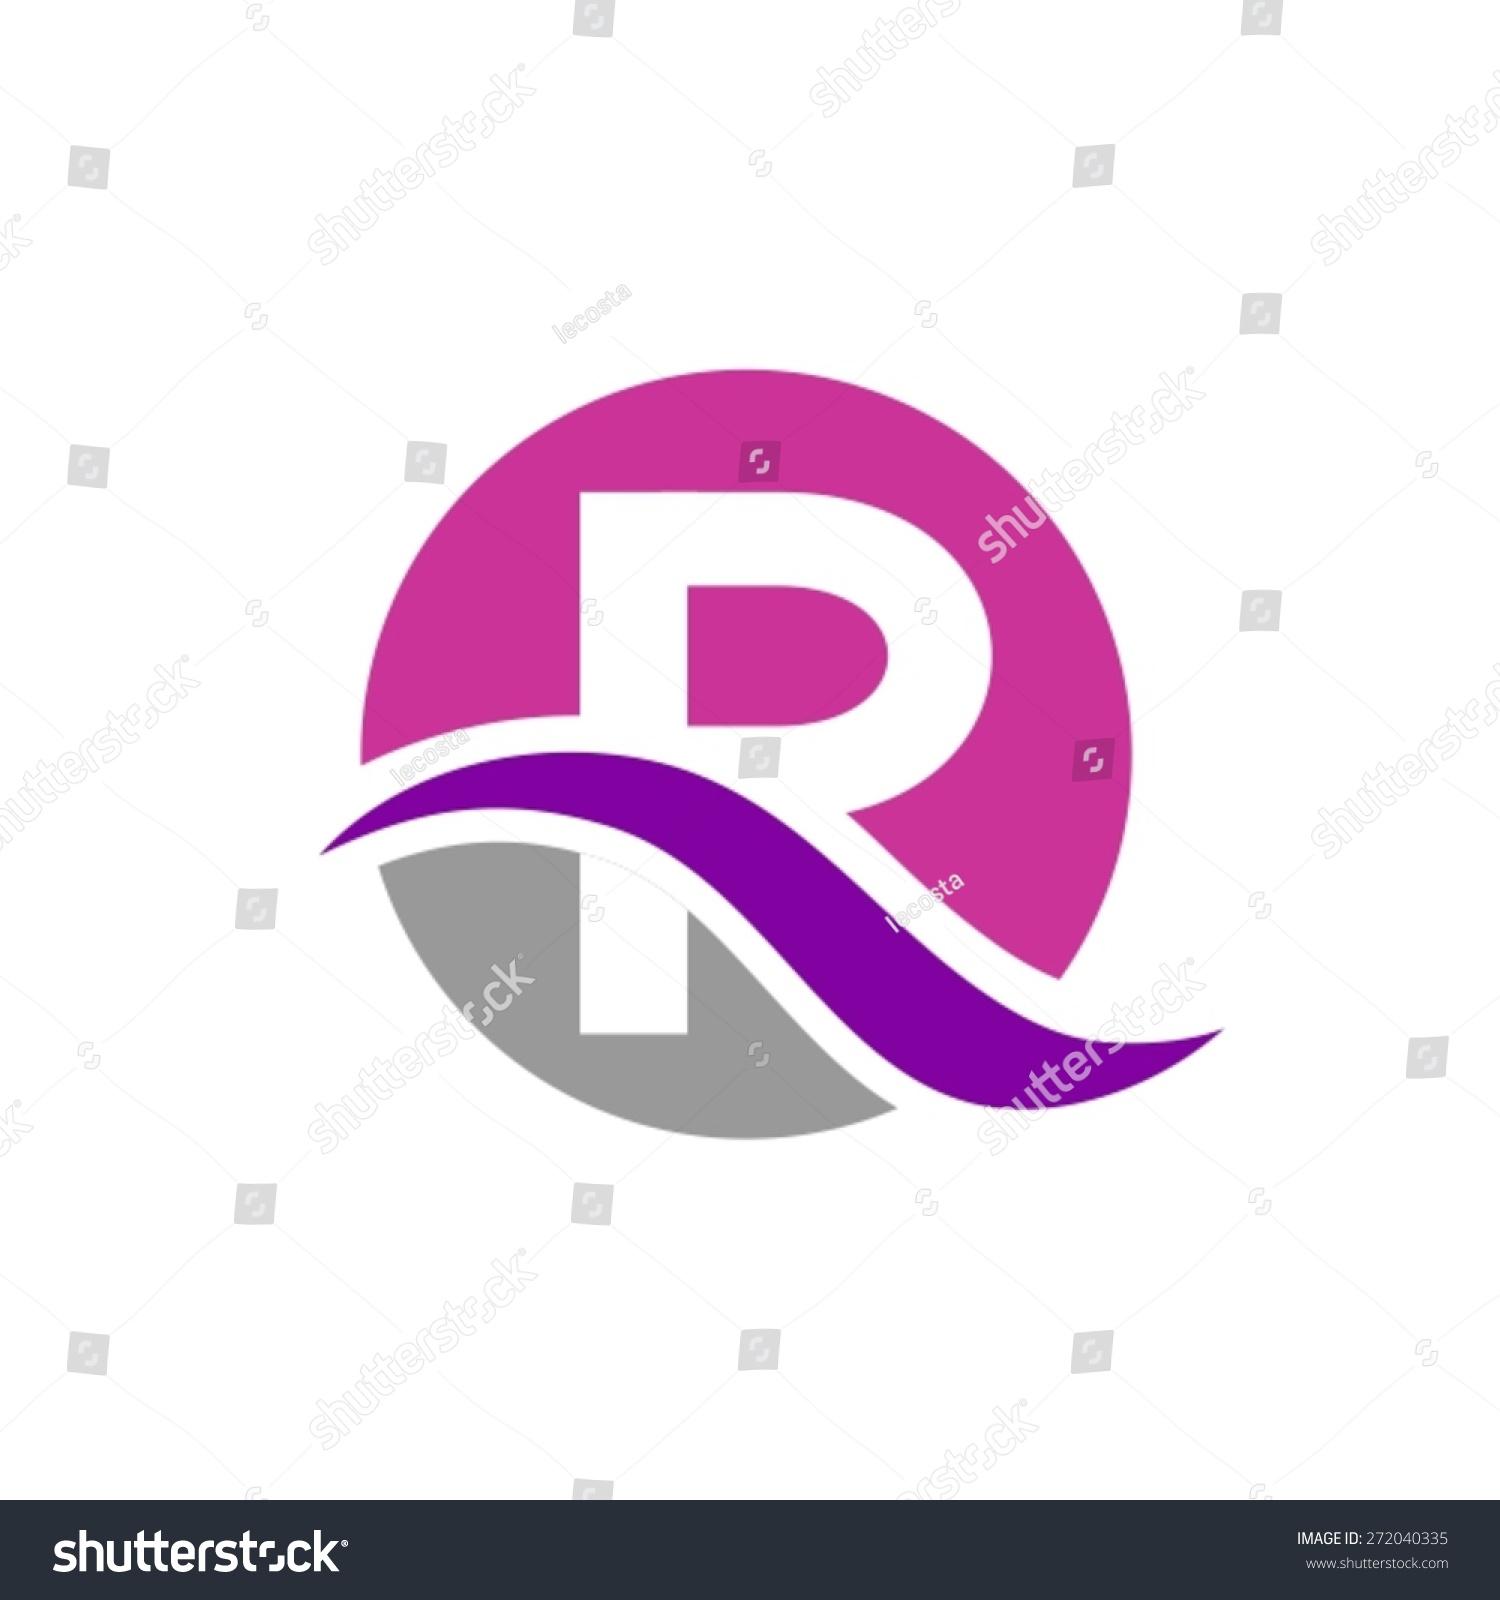 clipart logo creator - photo #11